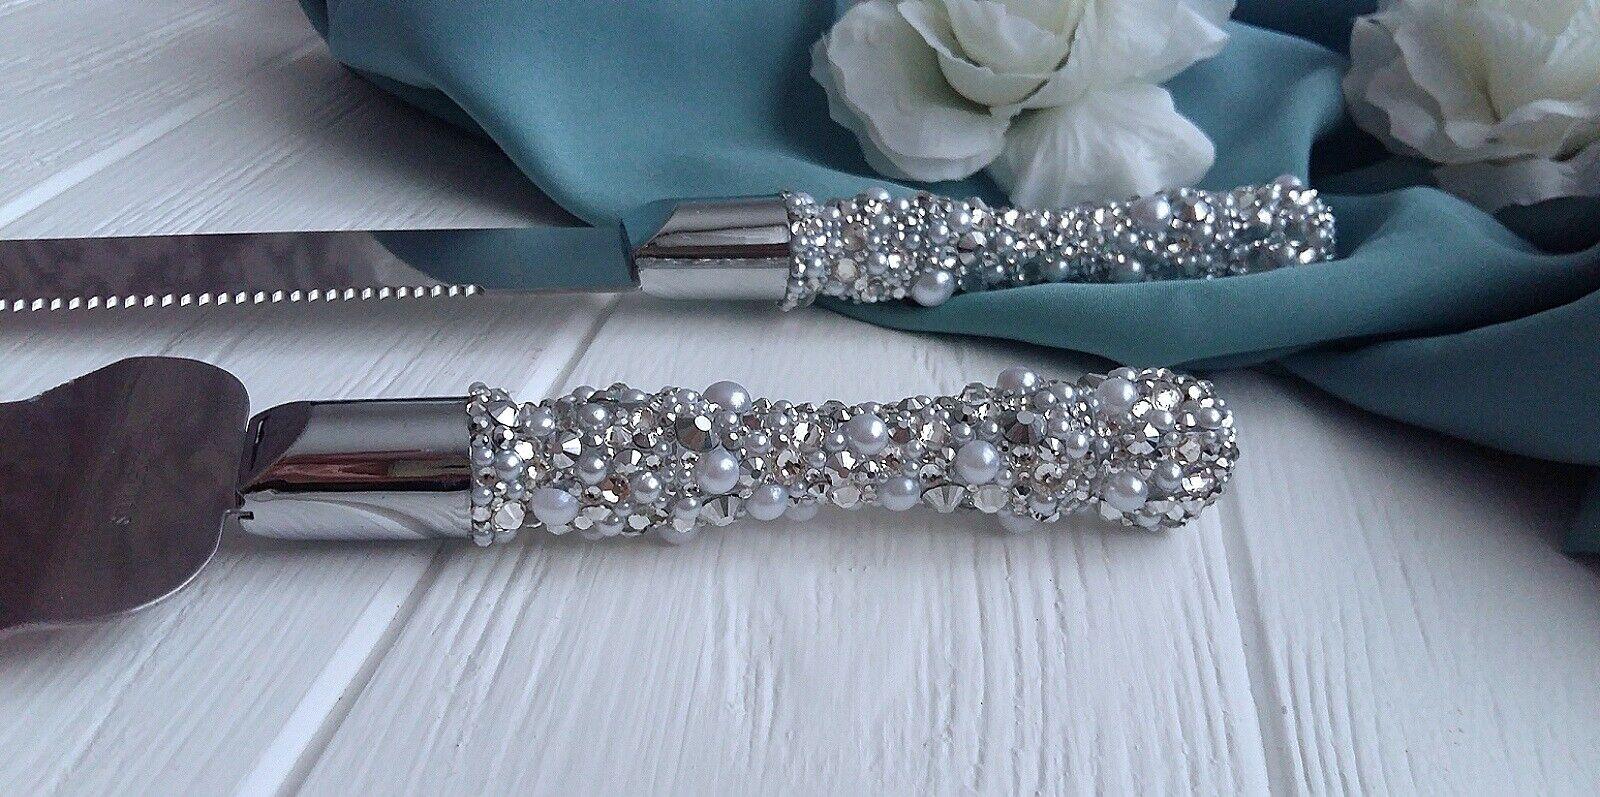 Crystal wedding cake knife and server set Cake cutting set cake serving set